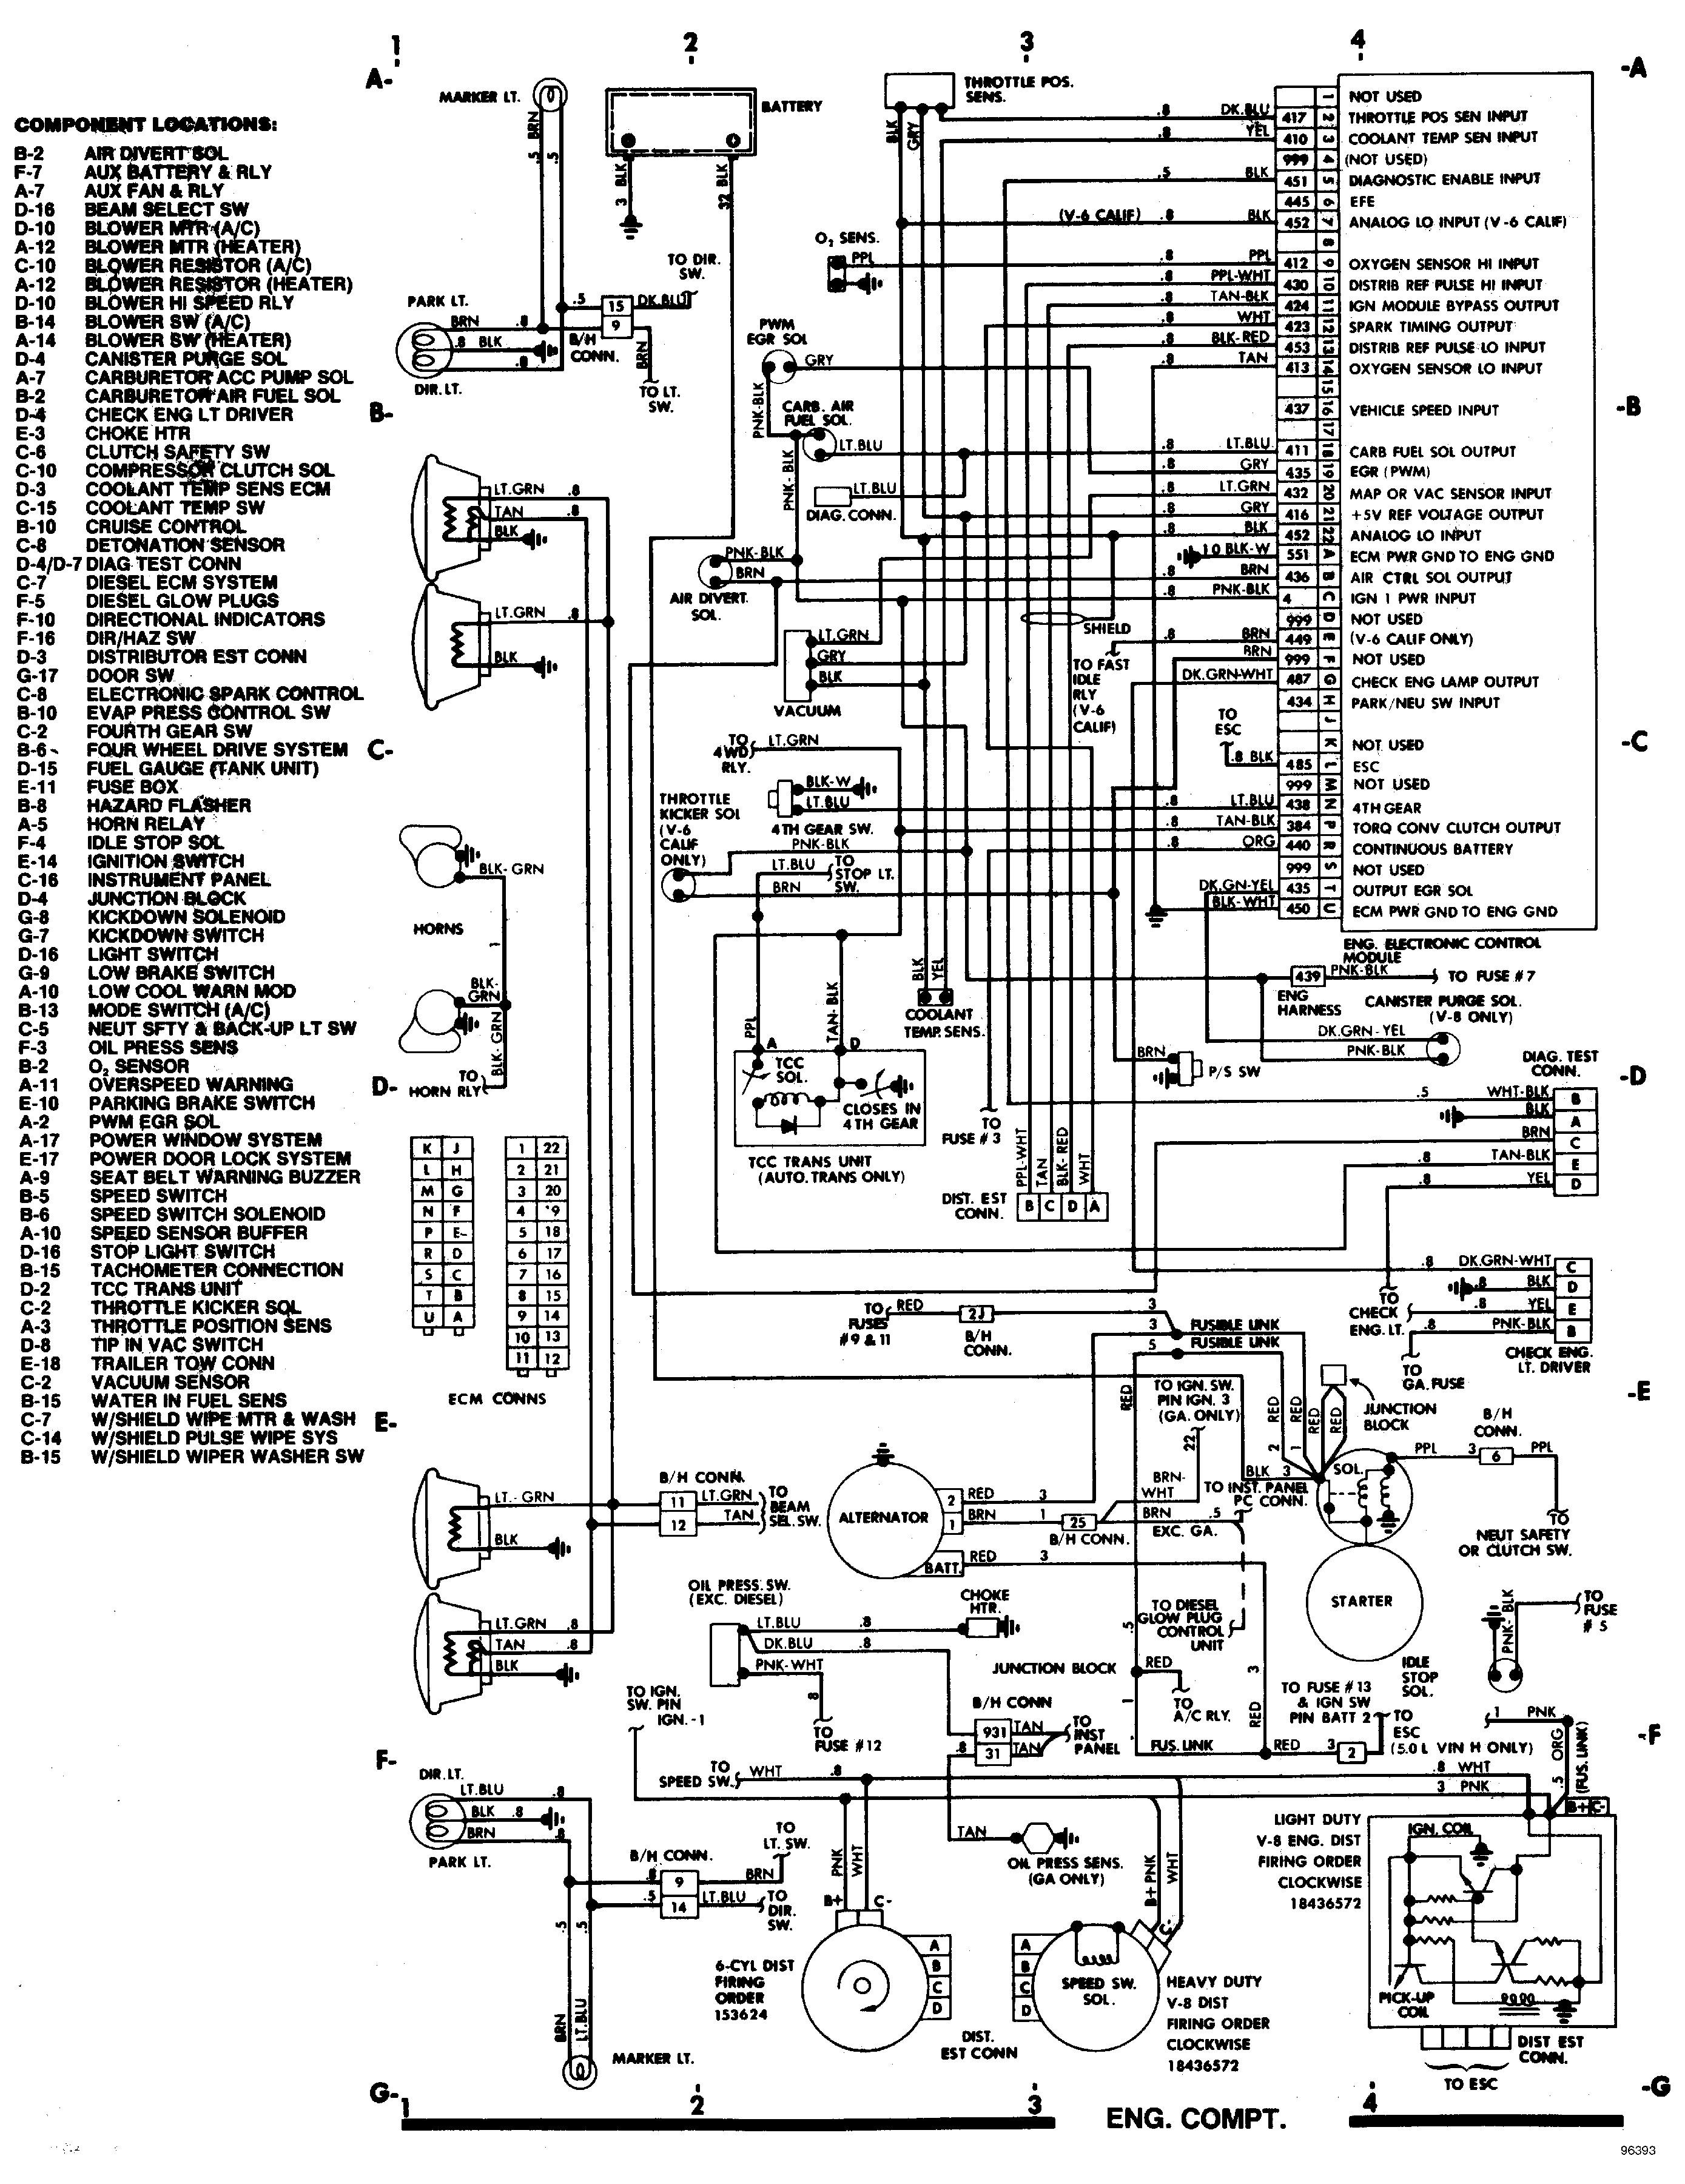 85 Chevrolet Steering Column Wiring Diagram | wiring diagram horizon | Chevrolet Steering Column Wiring Diagram |  | apriliakolada.it